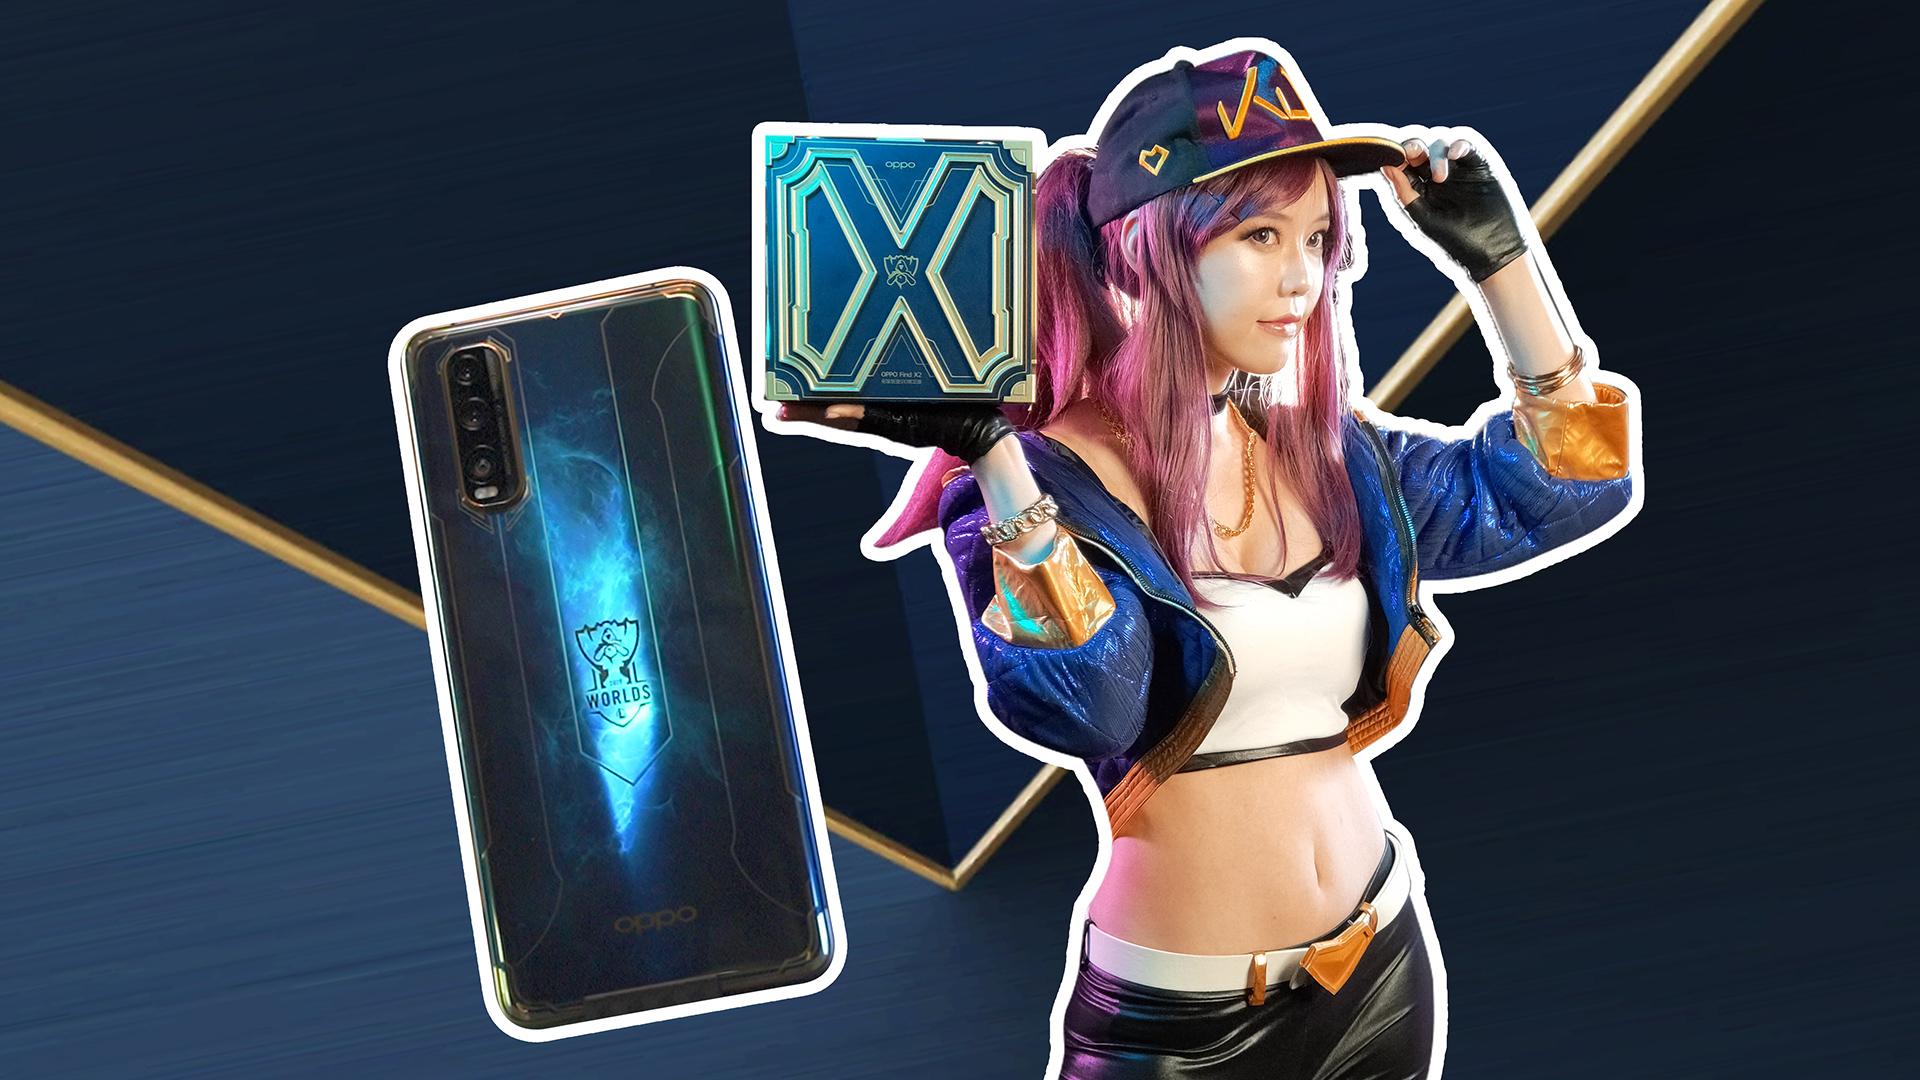 Zing Gadget | LOL限量手机 OPPO Find X2 英雄联盟S10限定版!